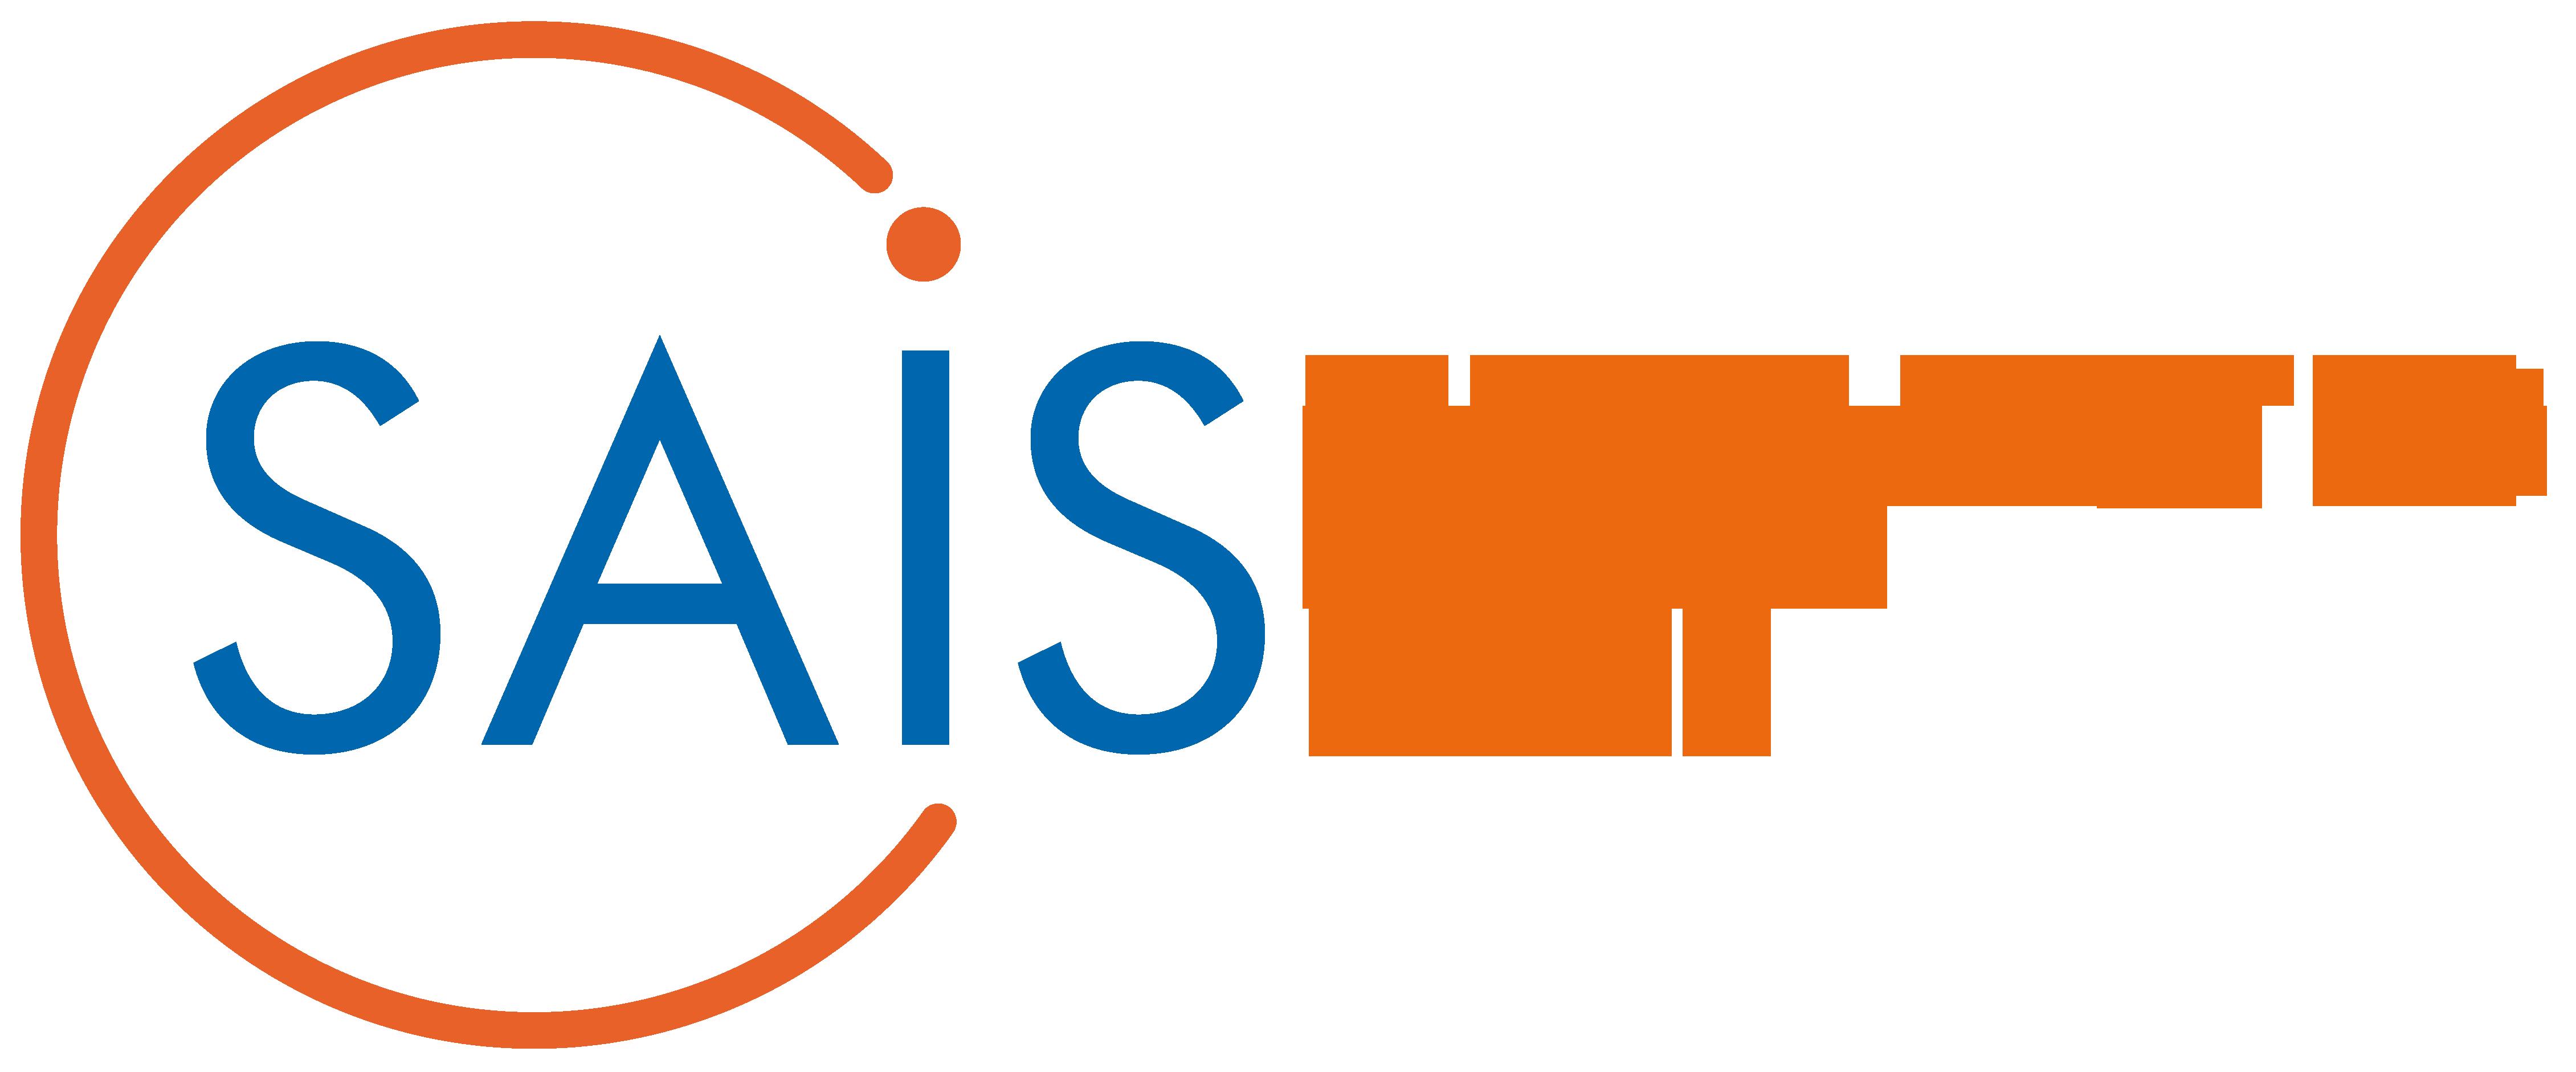 SAIS Connected Hubs